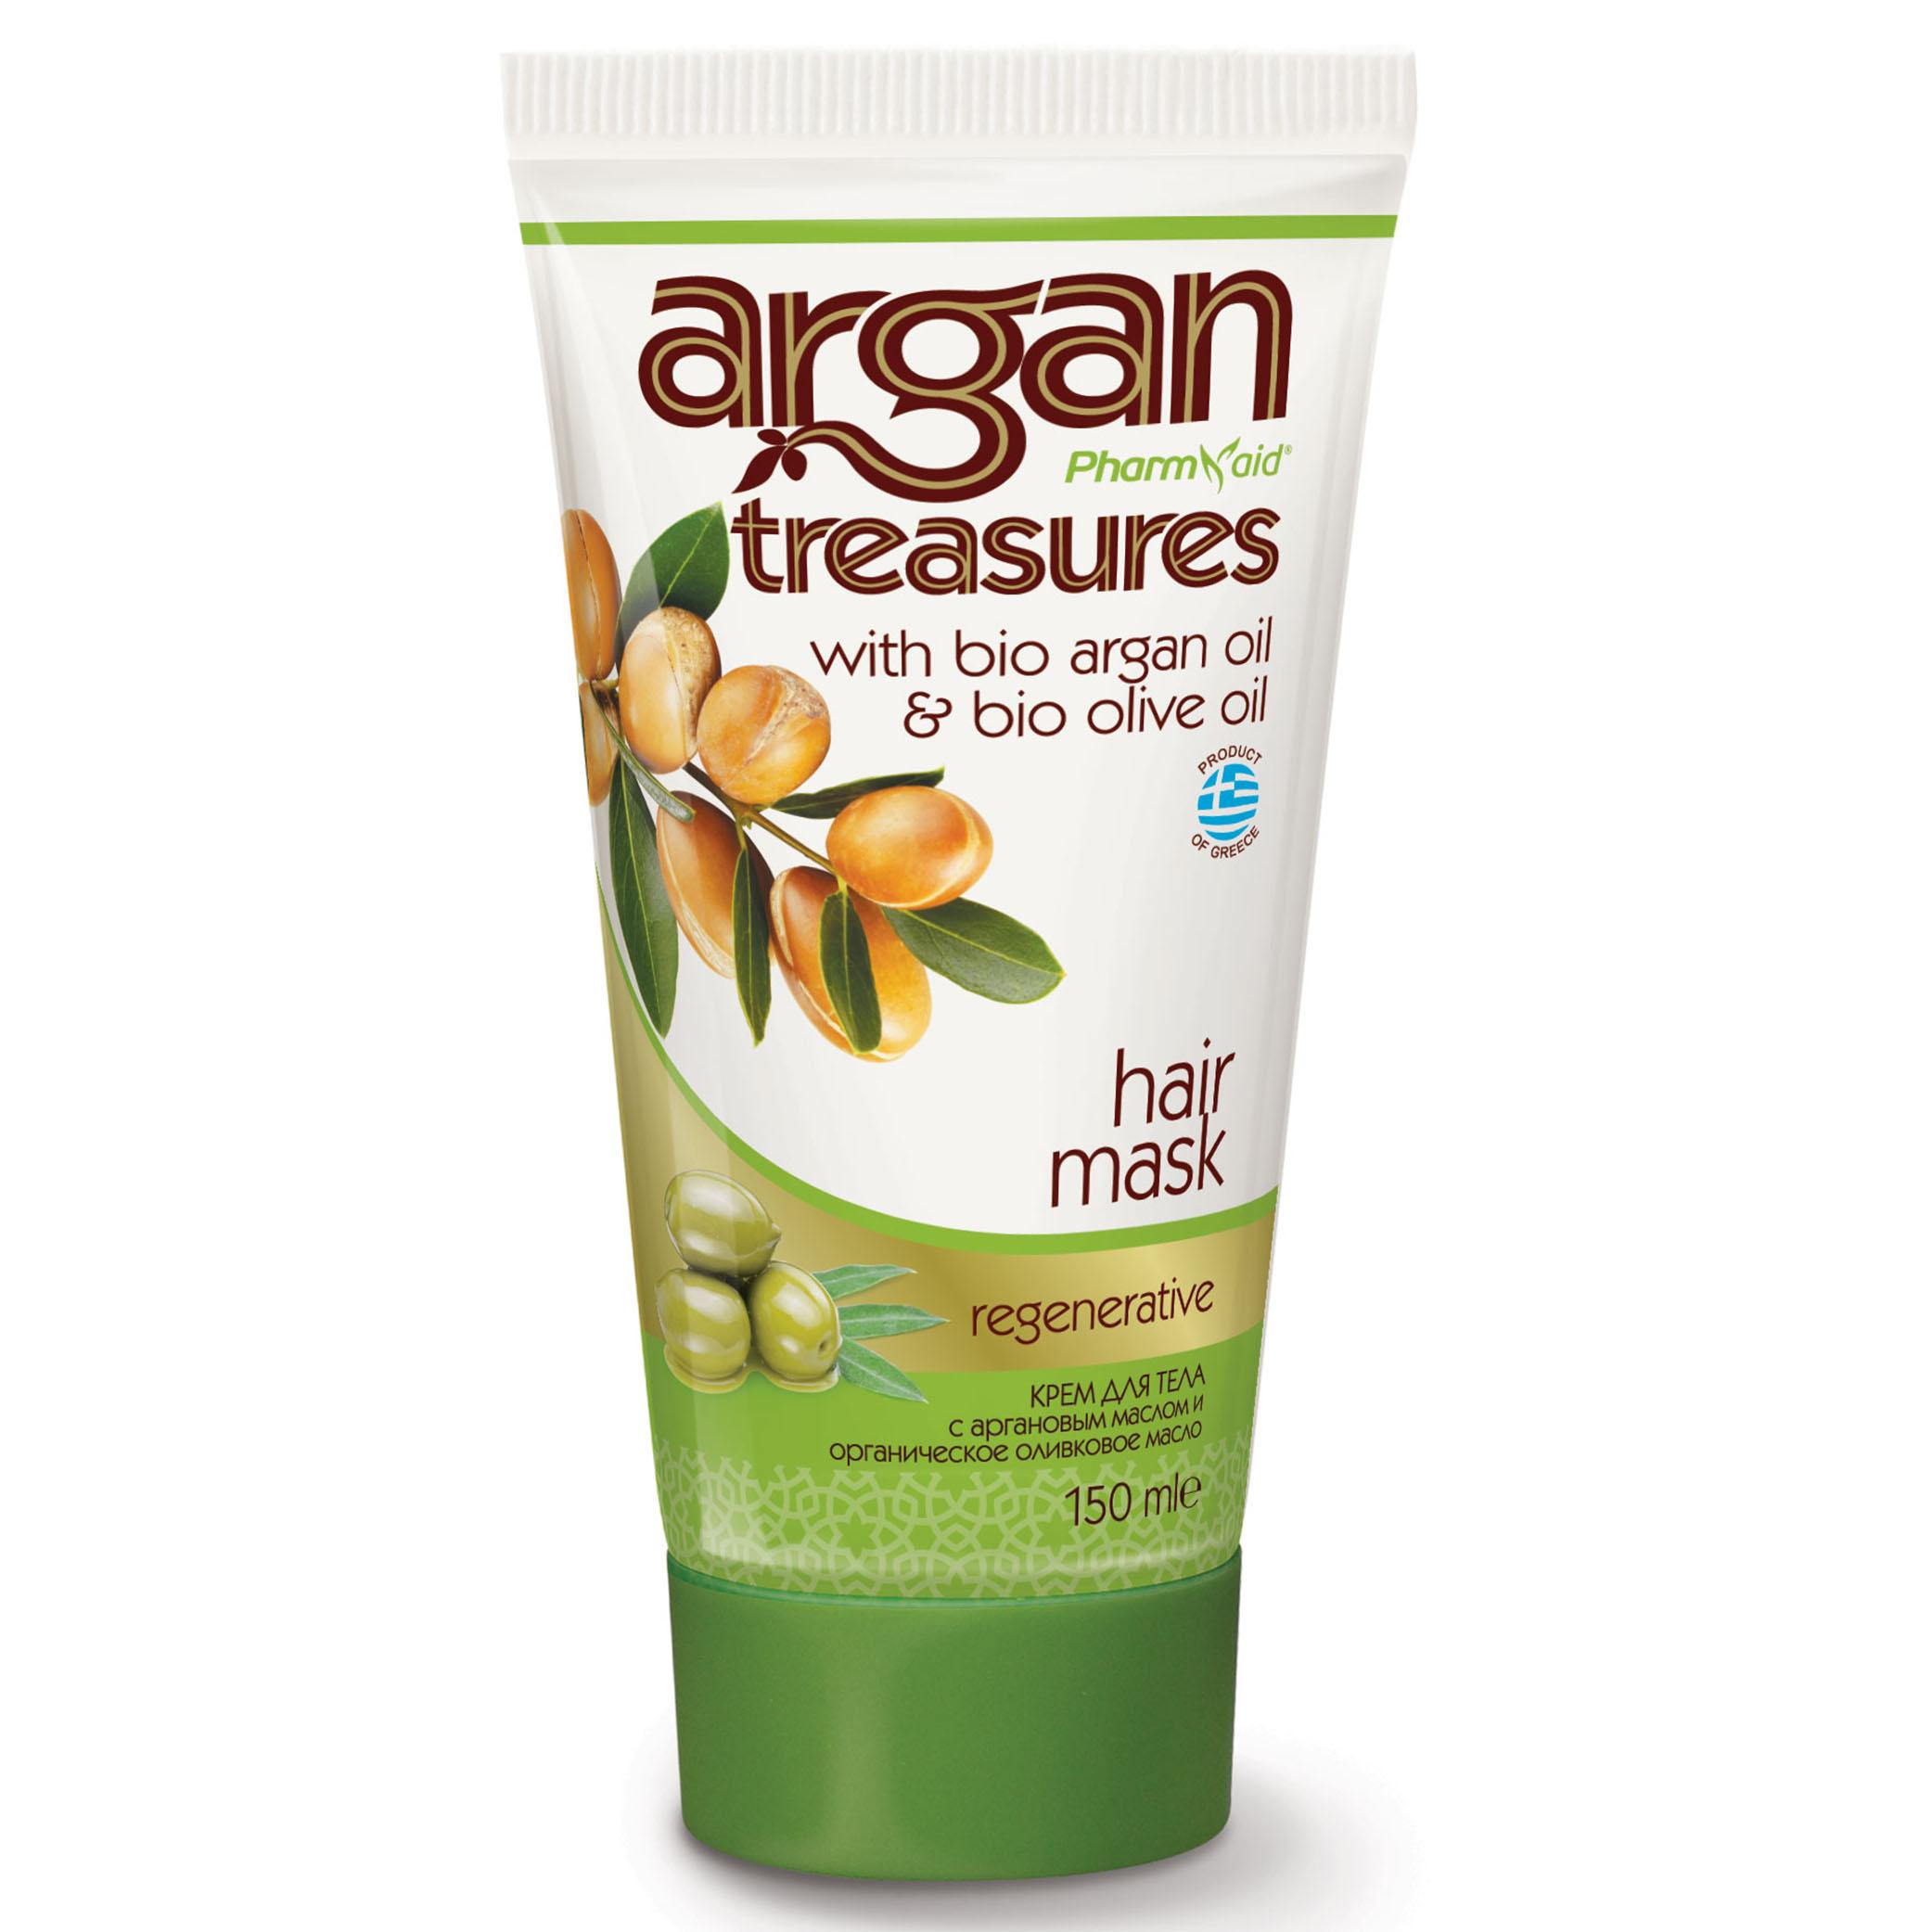 Pharmaid Argan Treasures Hair Mask All Types 150ml